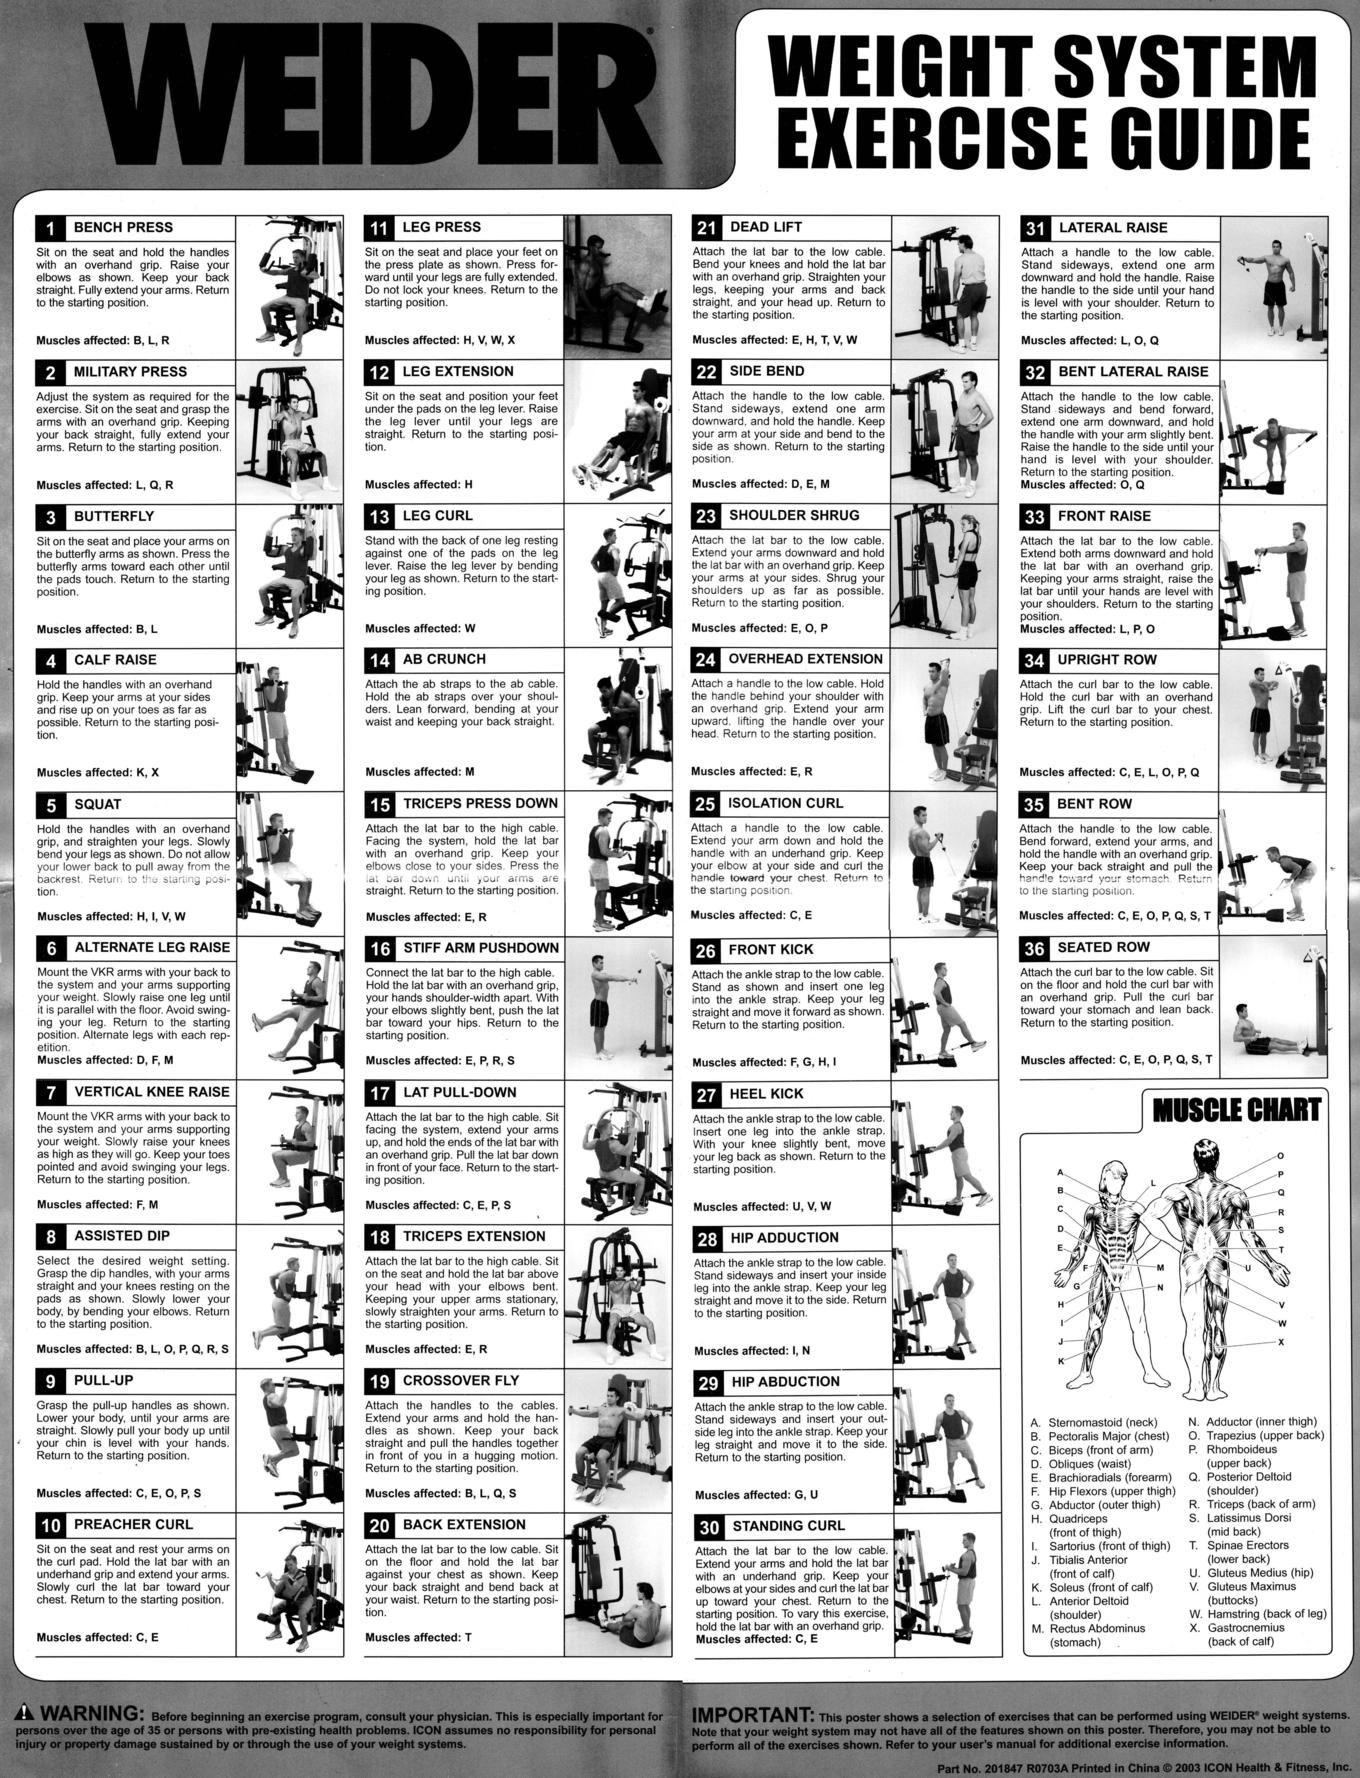 Weider Pro 6900 Exercise Chart | Exercise chart, Exercises